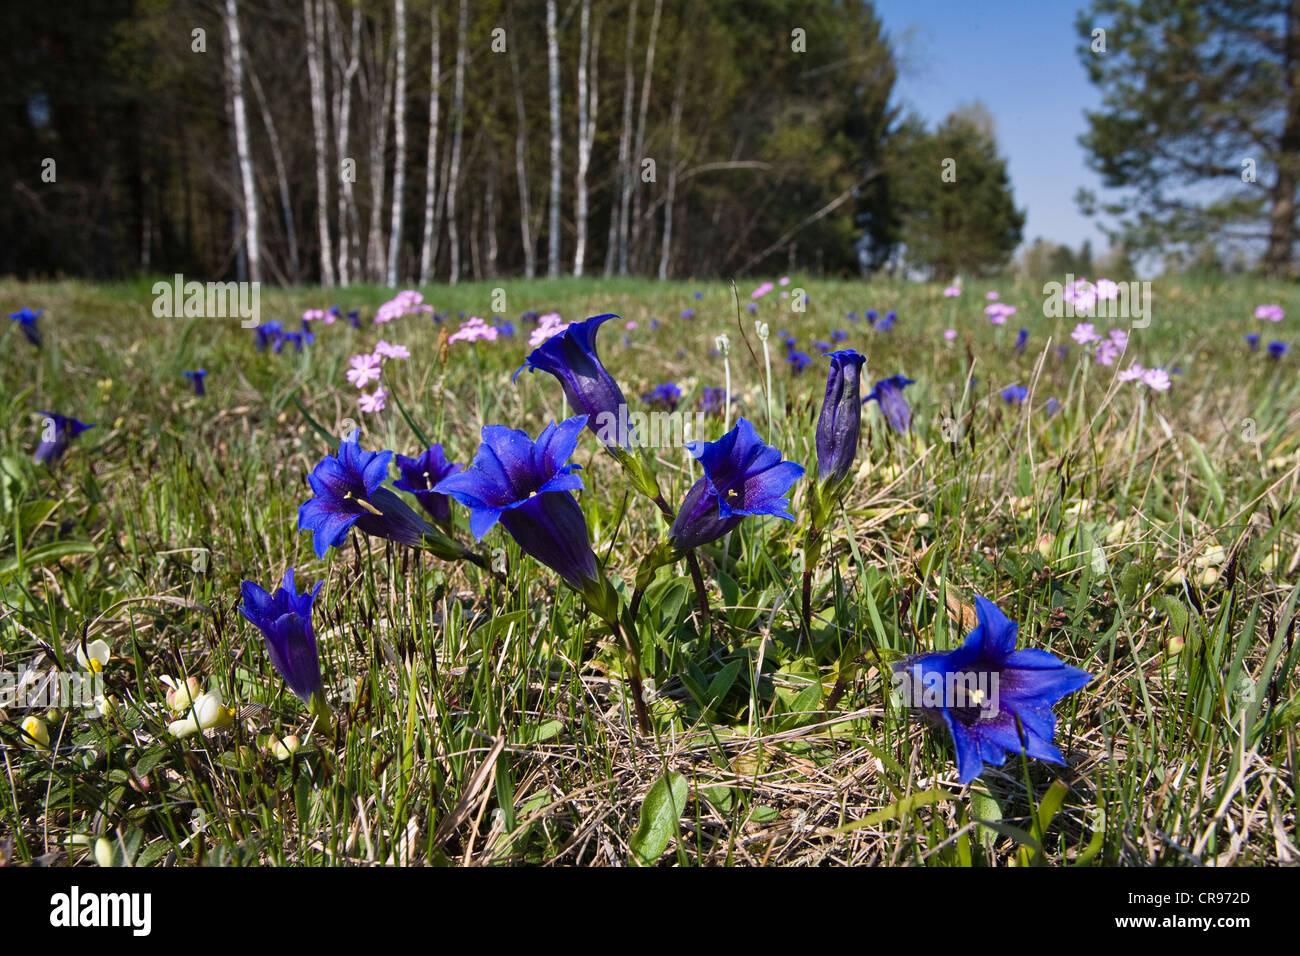 Flower field with clusius gentians (Gentiana clusii) and bird's-eye primroses (Primula farinosa), Upper Bavaria, - Stock Image